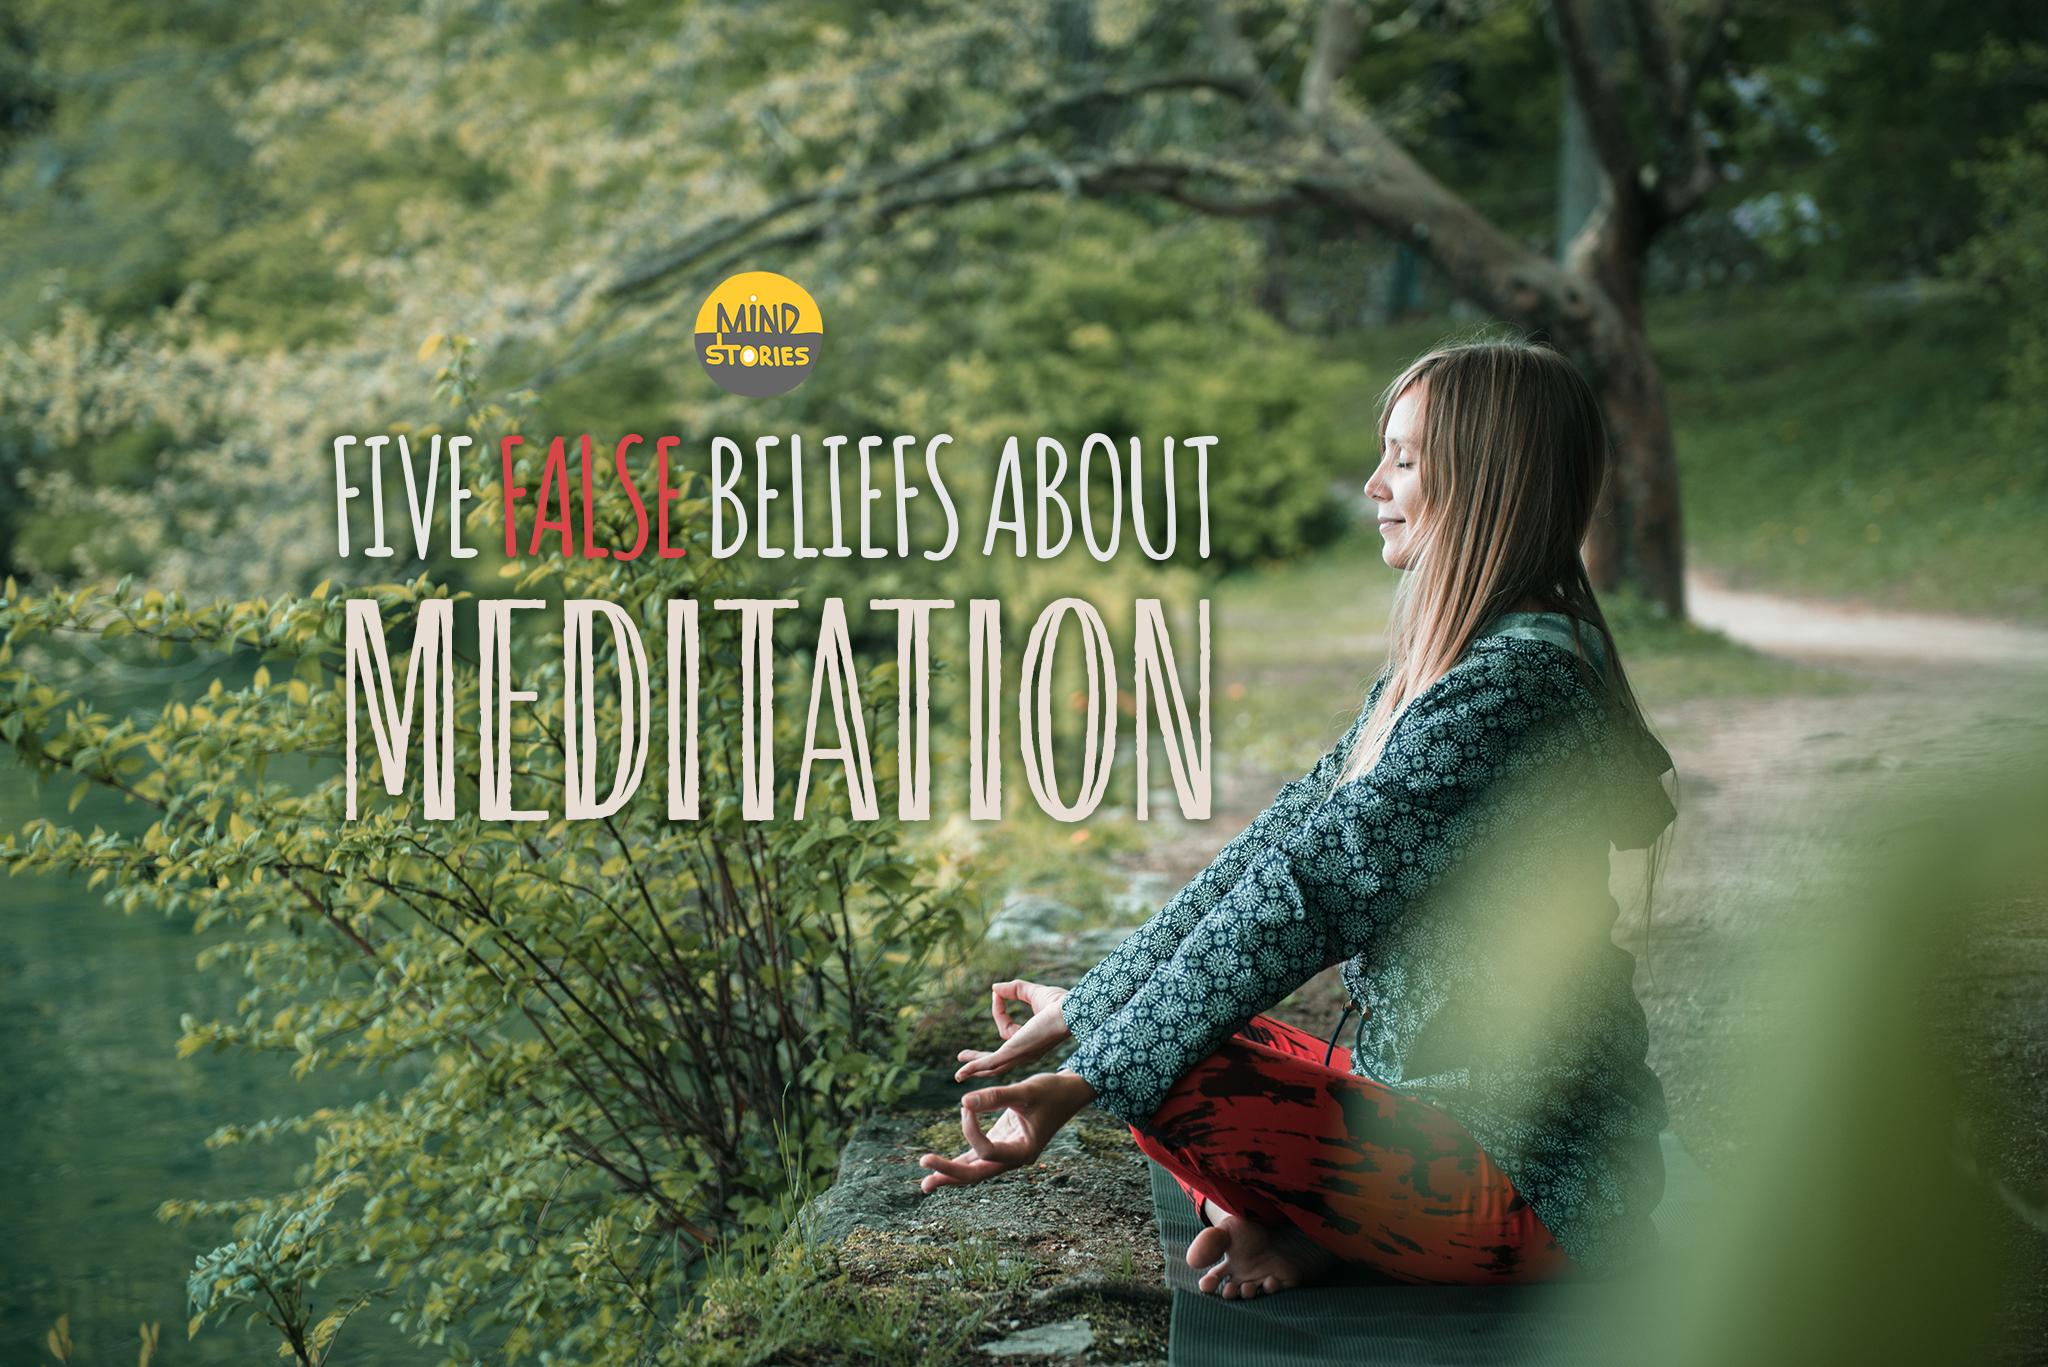 5 False Beliefs About Meditation